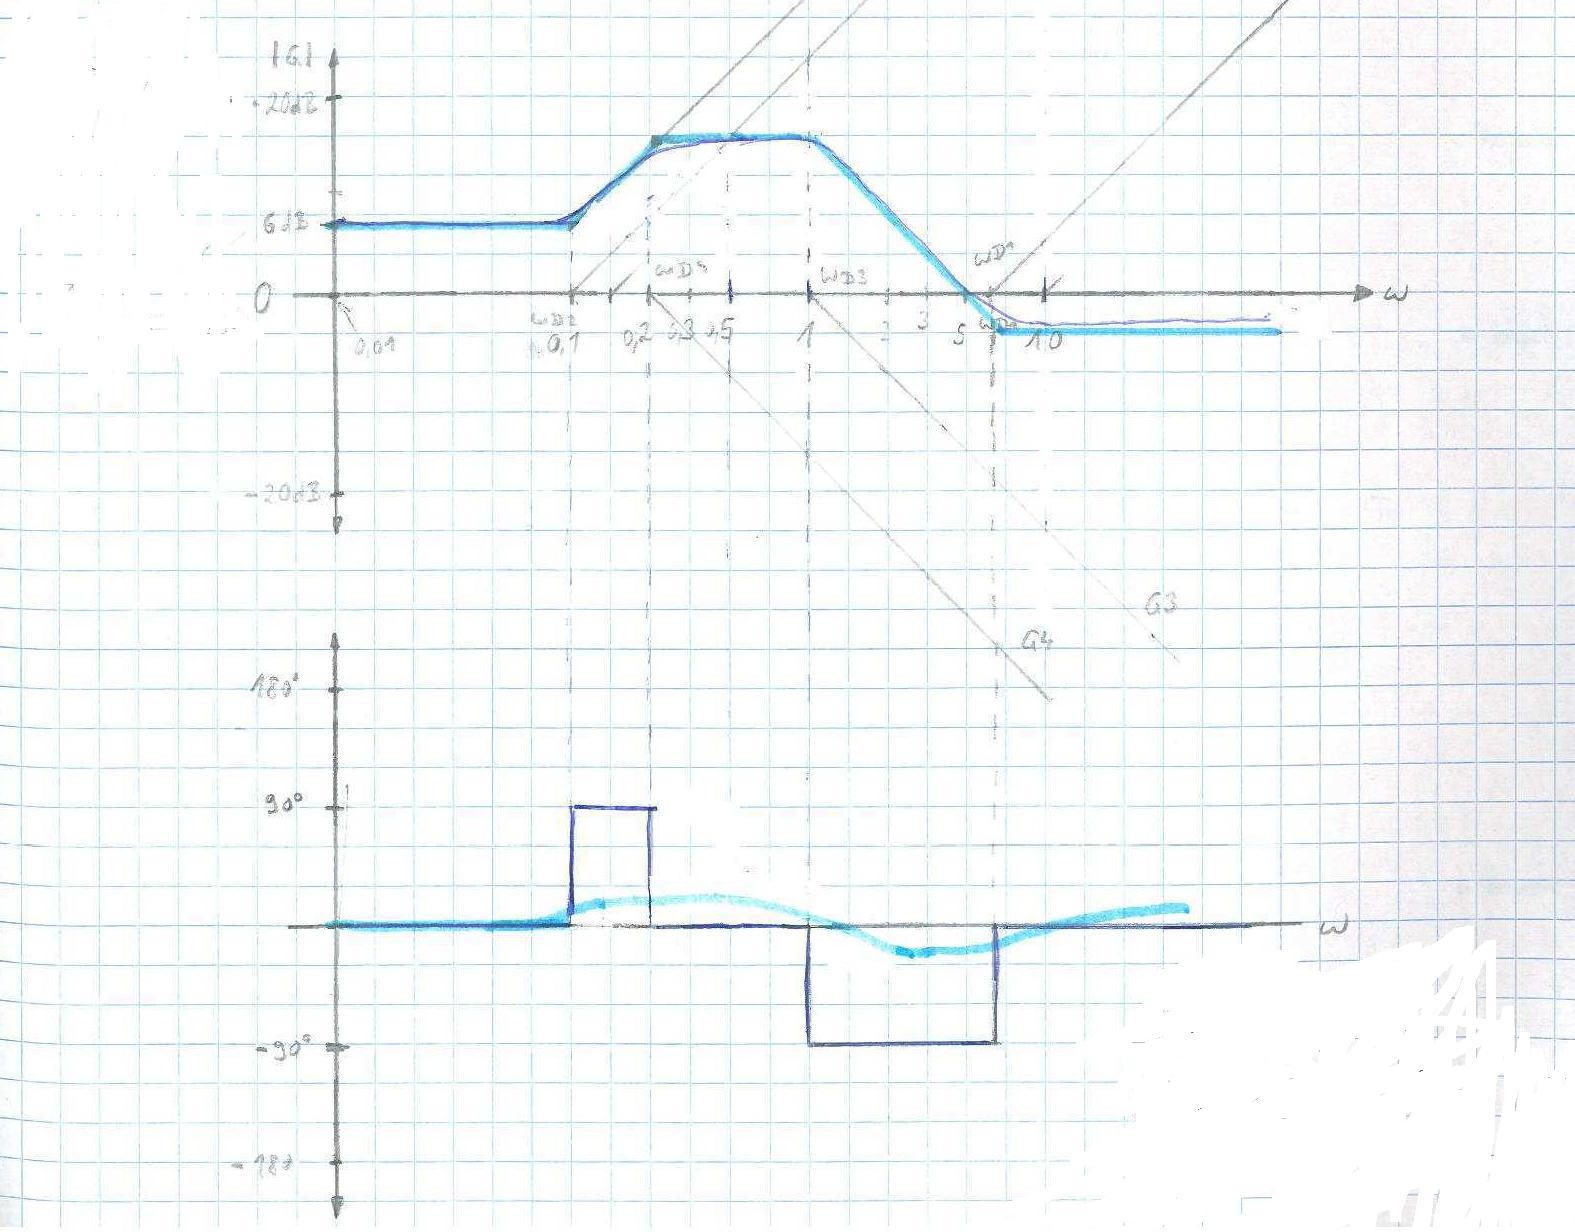 Bodediagramm(Amp-gang und Phasengang) - Mikrocontroller.net